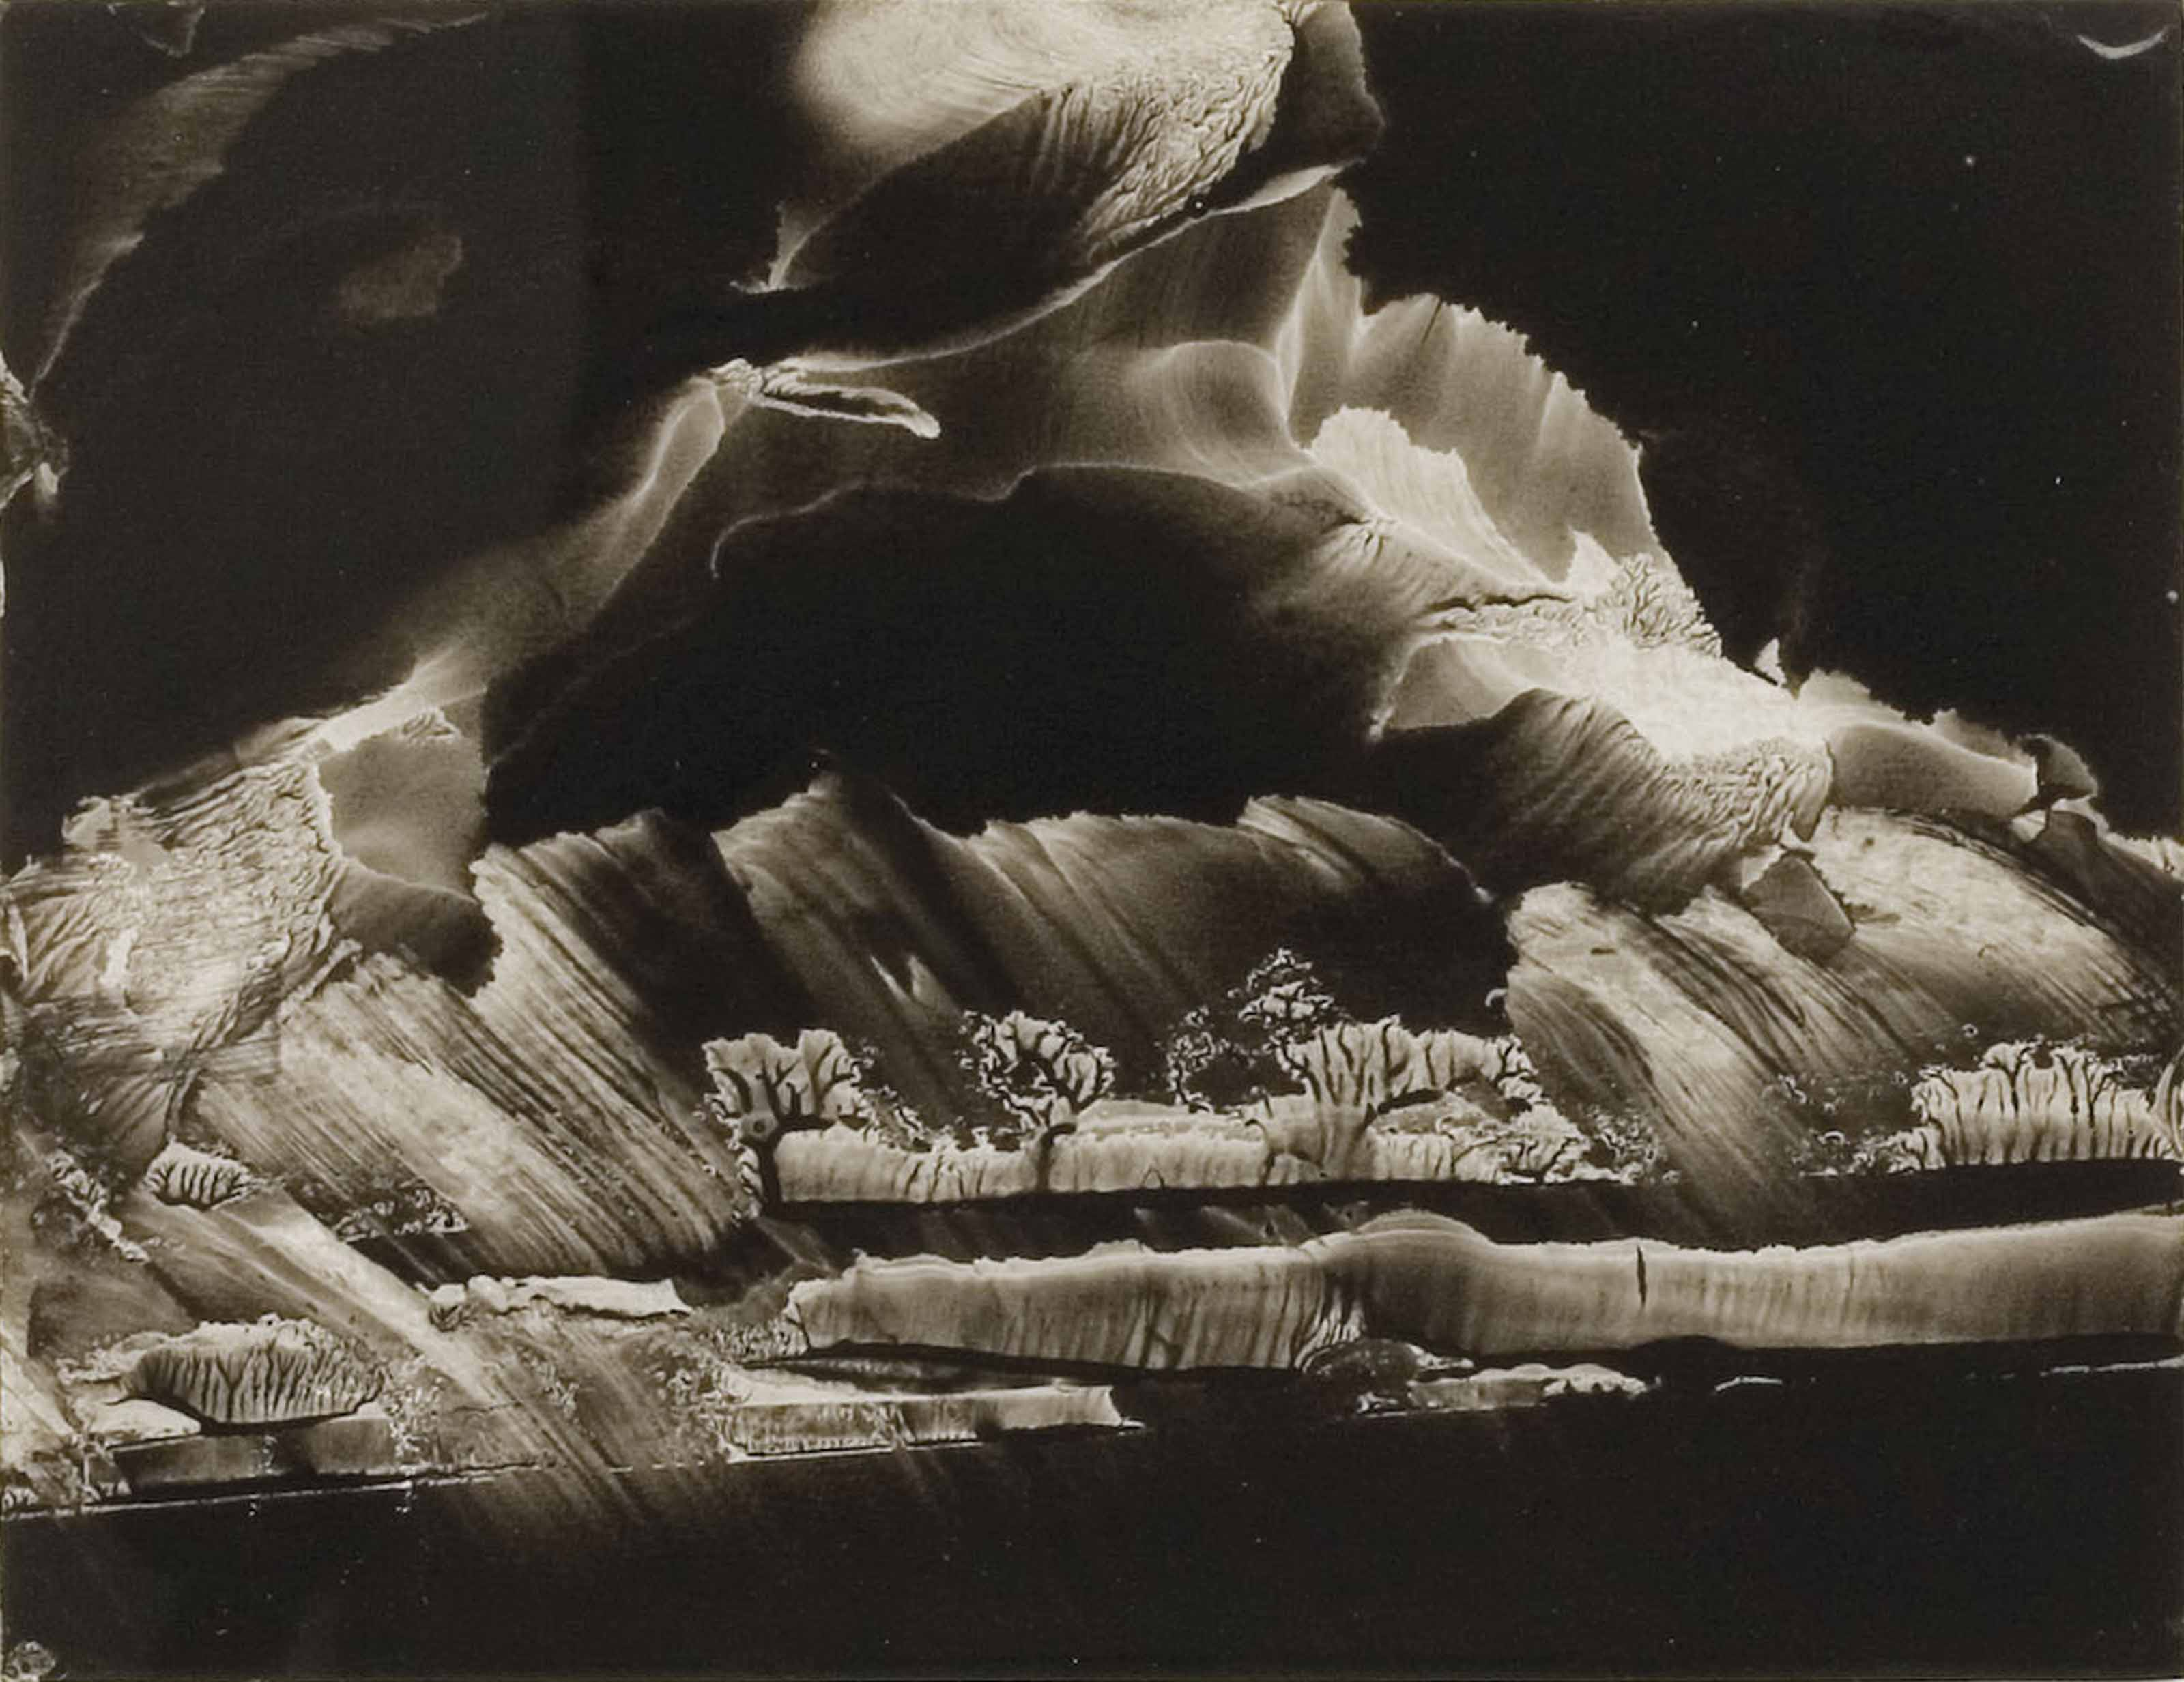 ROLAND FLEXNER (NÉ EN 1944)